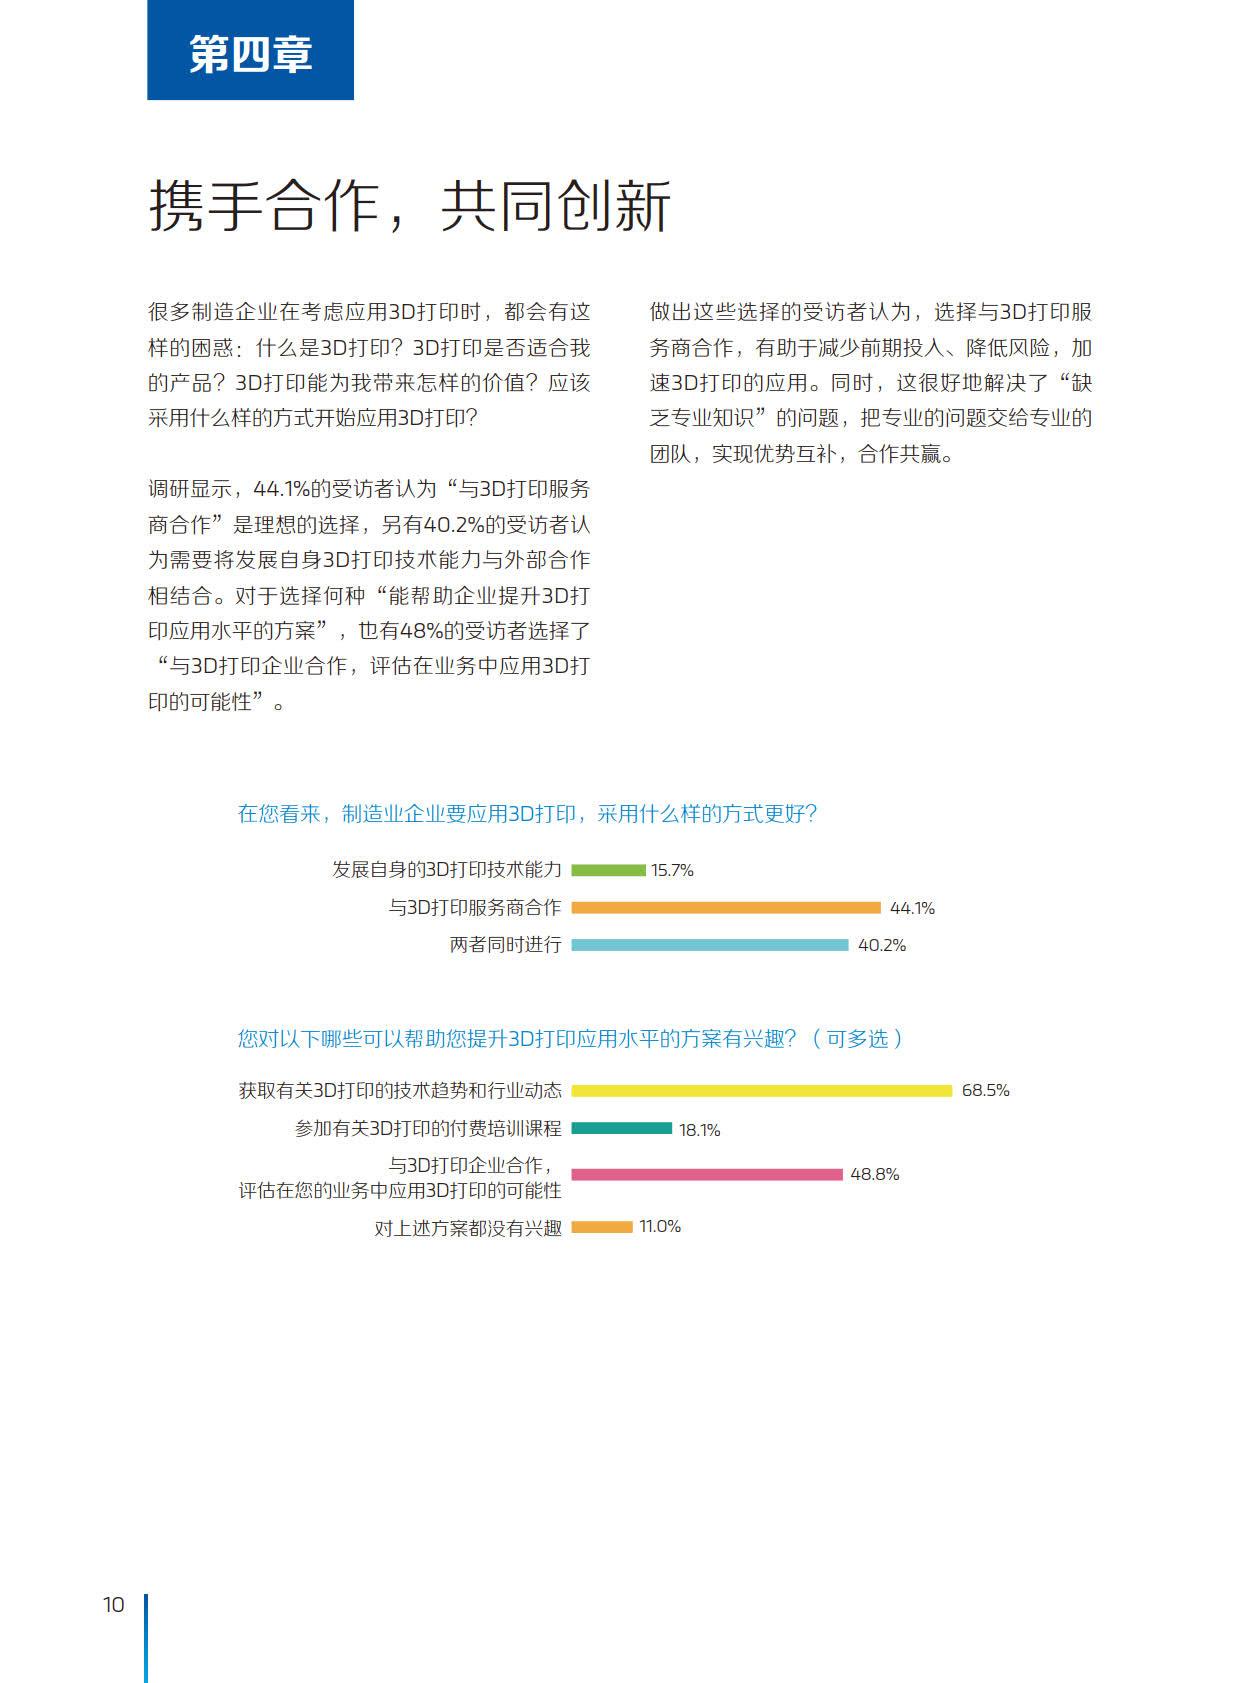 Materialise制造业调研报告_10.jpg